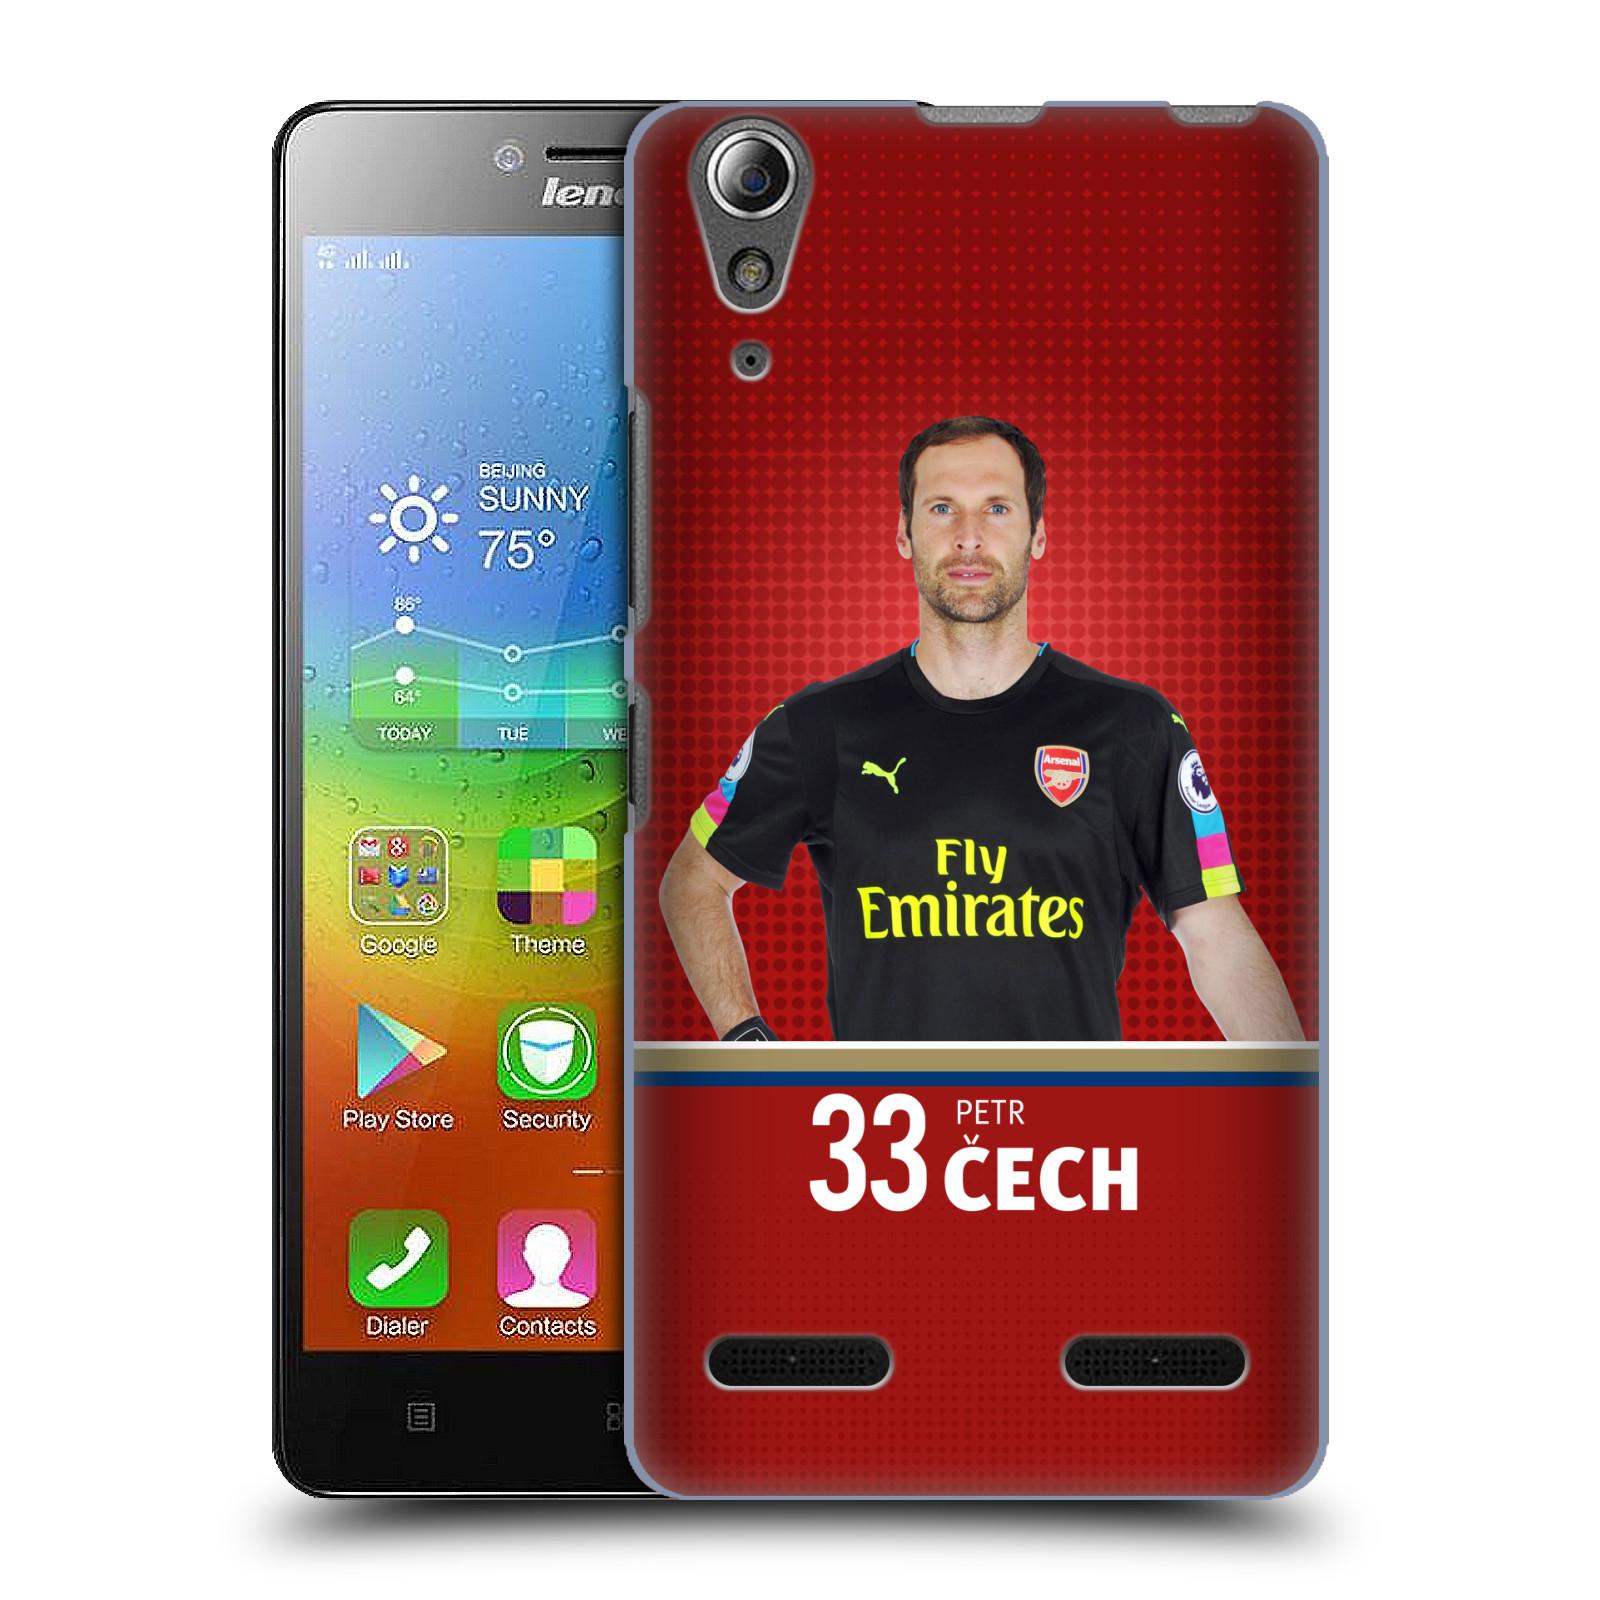 Plastové pouzdro na mobil Lenovo A6000 - Head Case - Arsenal FC - Petr Čech